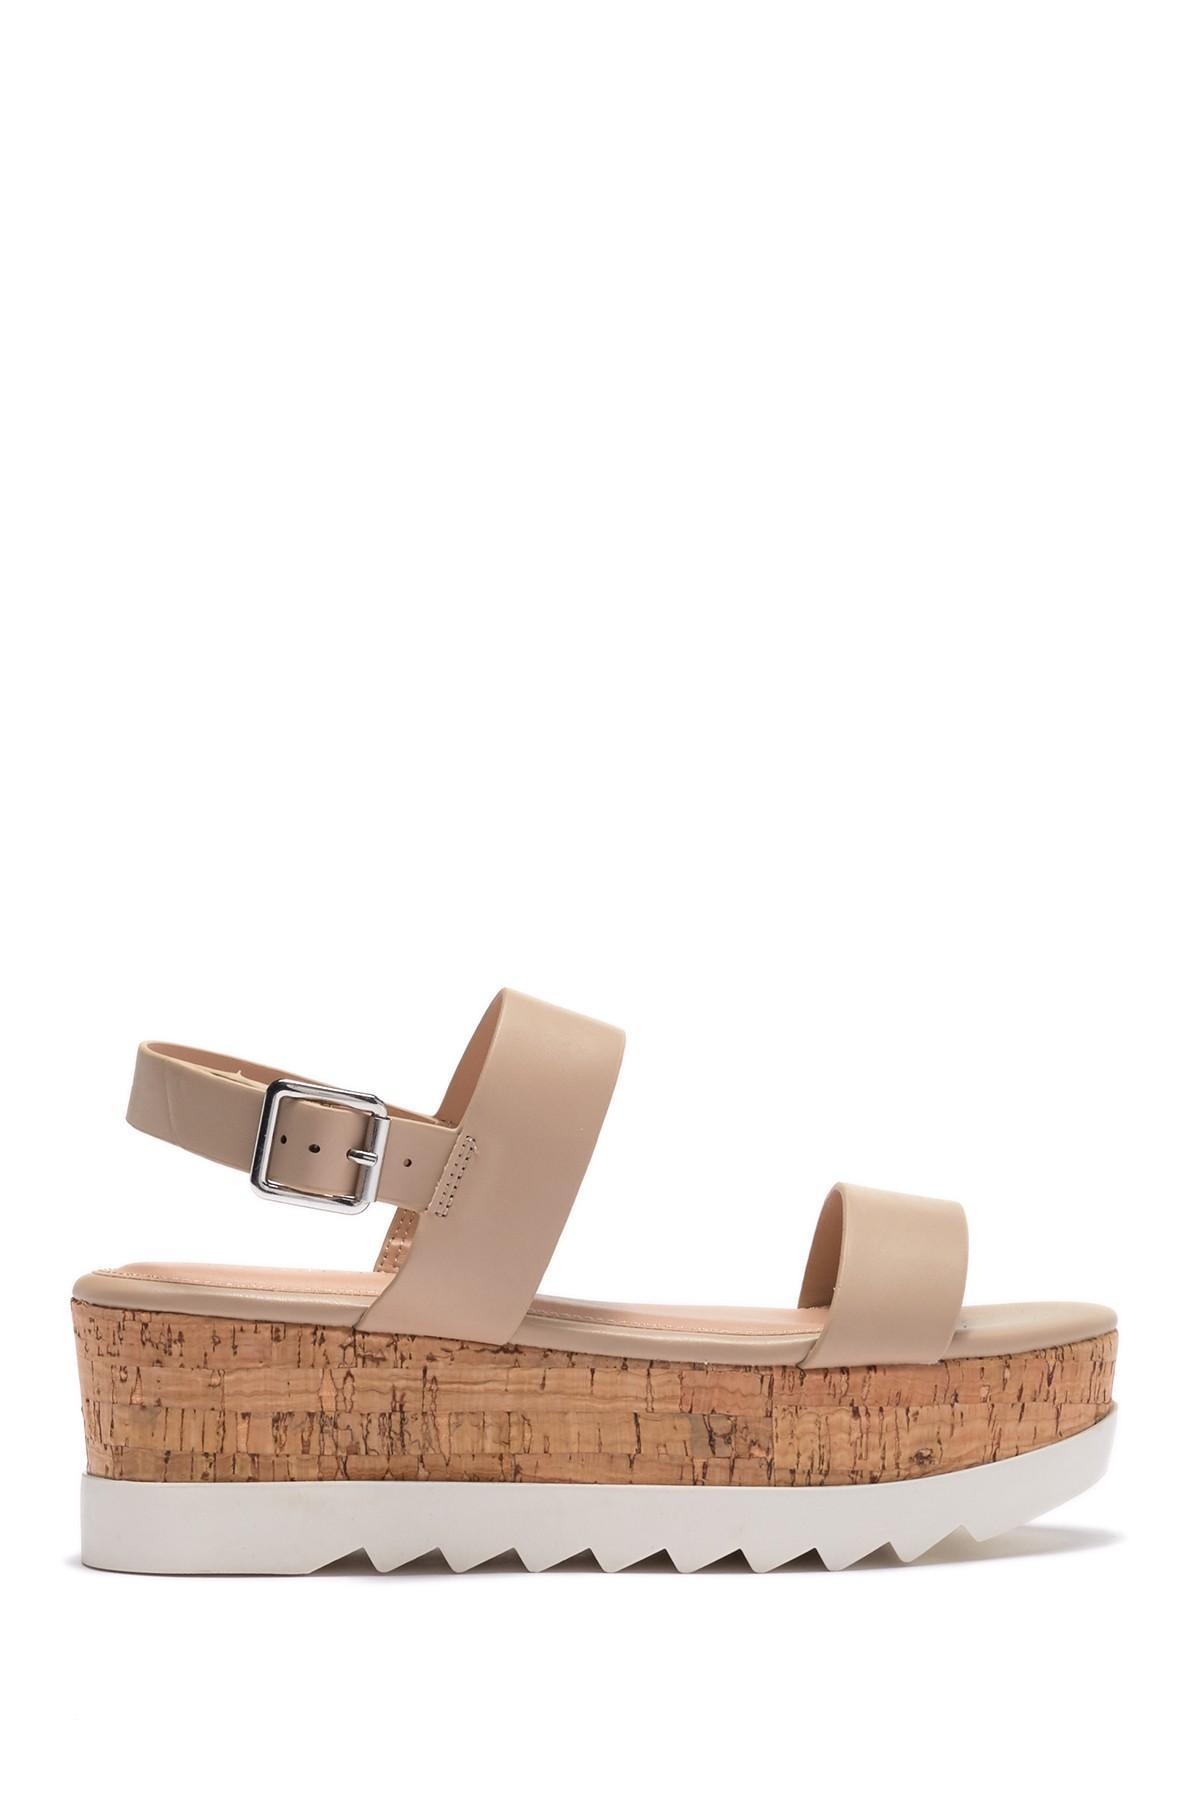 ceb12c49e992 Lyst - Madden Girl Sugar Platform Strappy Sandal